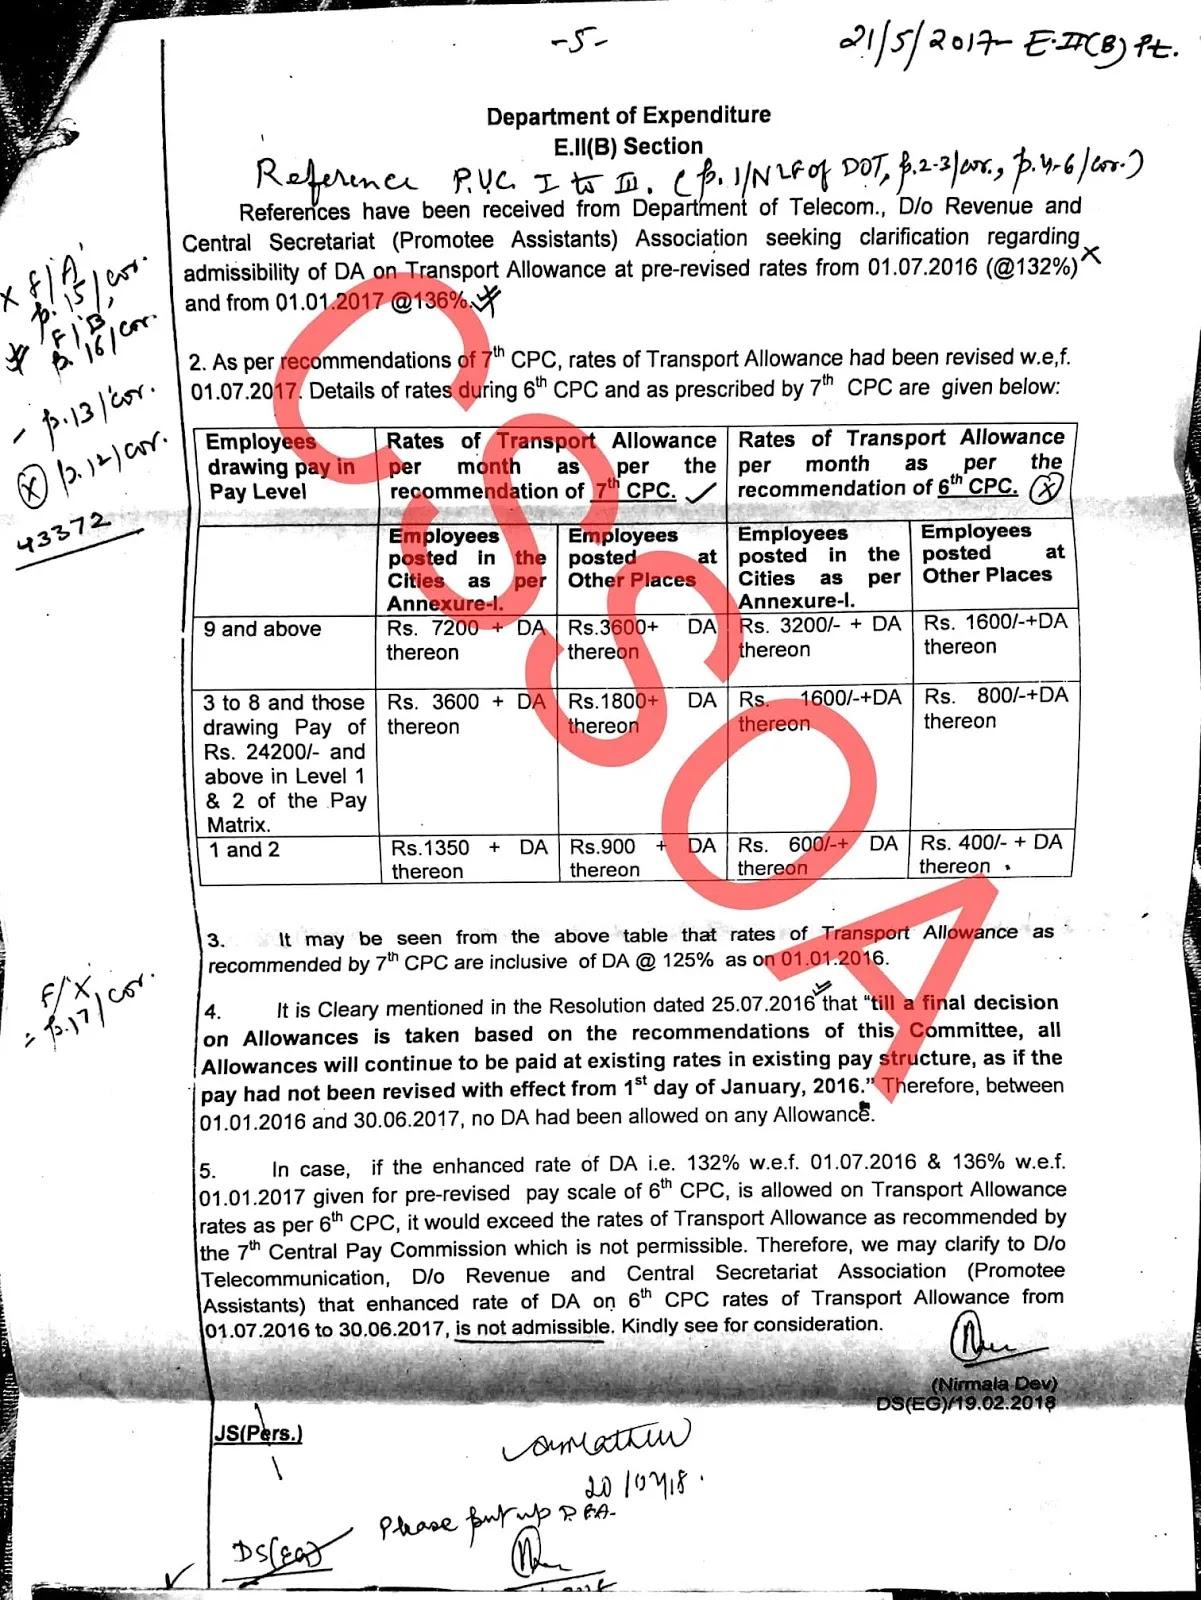 6th-CPC-DA-on-TpT-Allowance-denied-by-doe